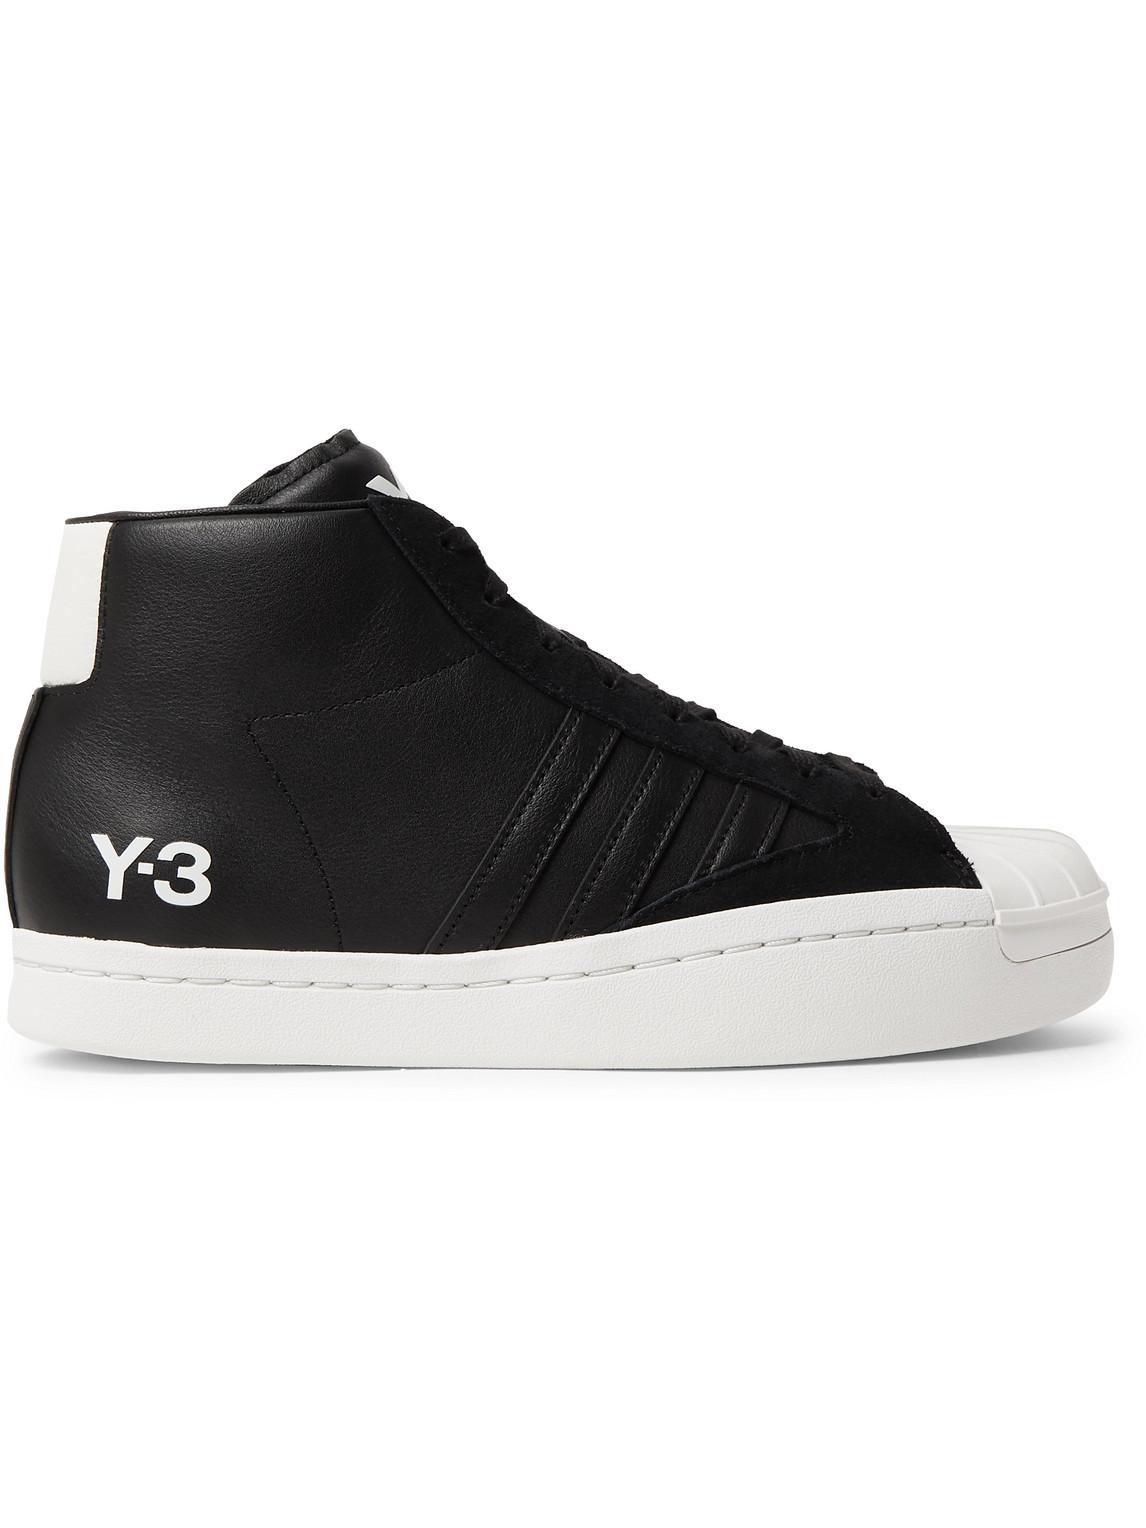 y-3 - yohji pro suede-trimmed leather high-top sneakers - men - black - uk 10